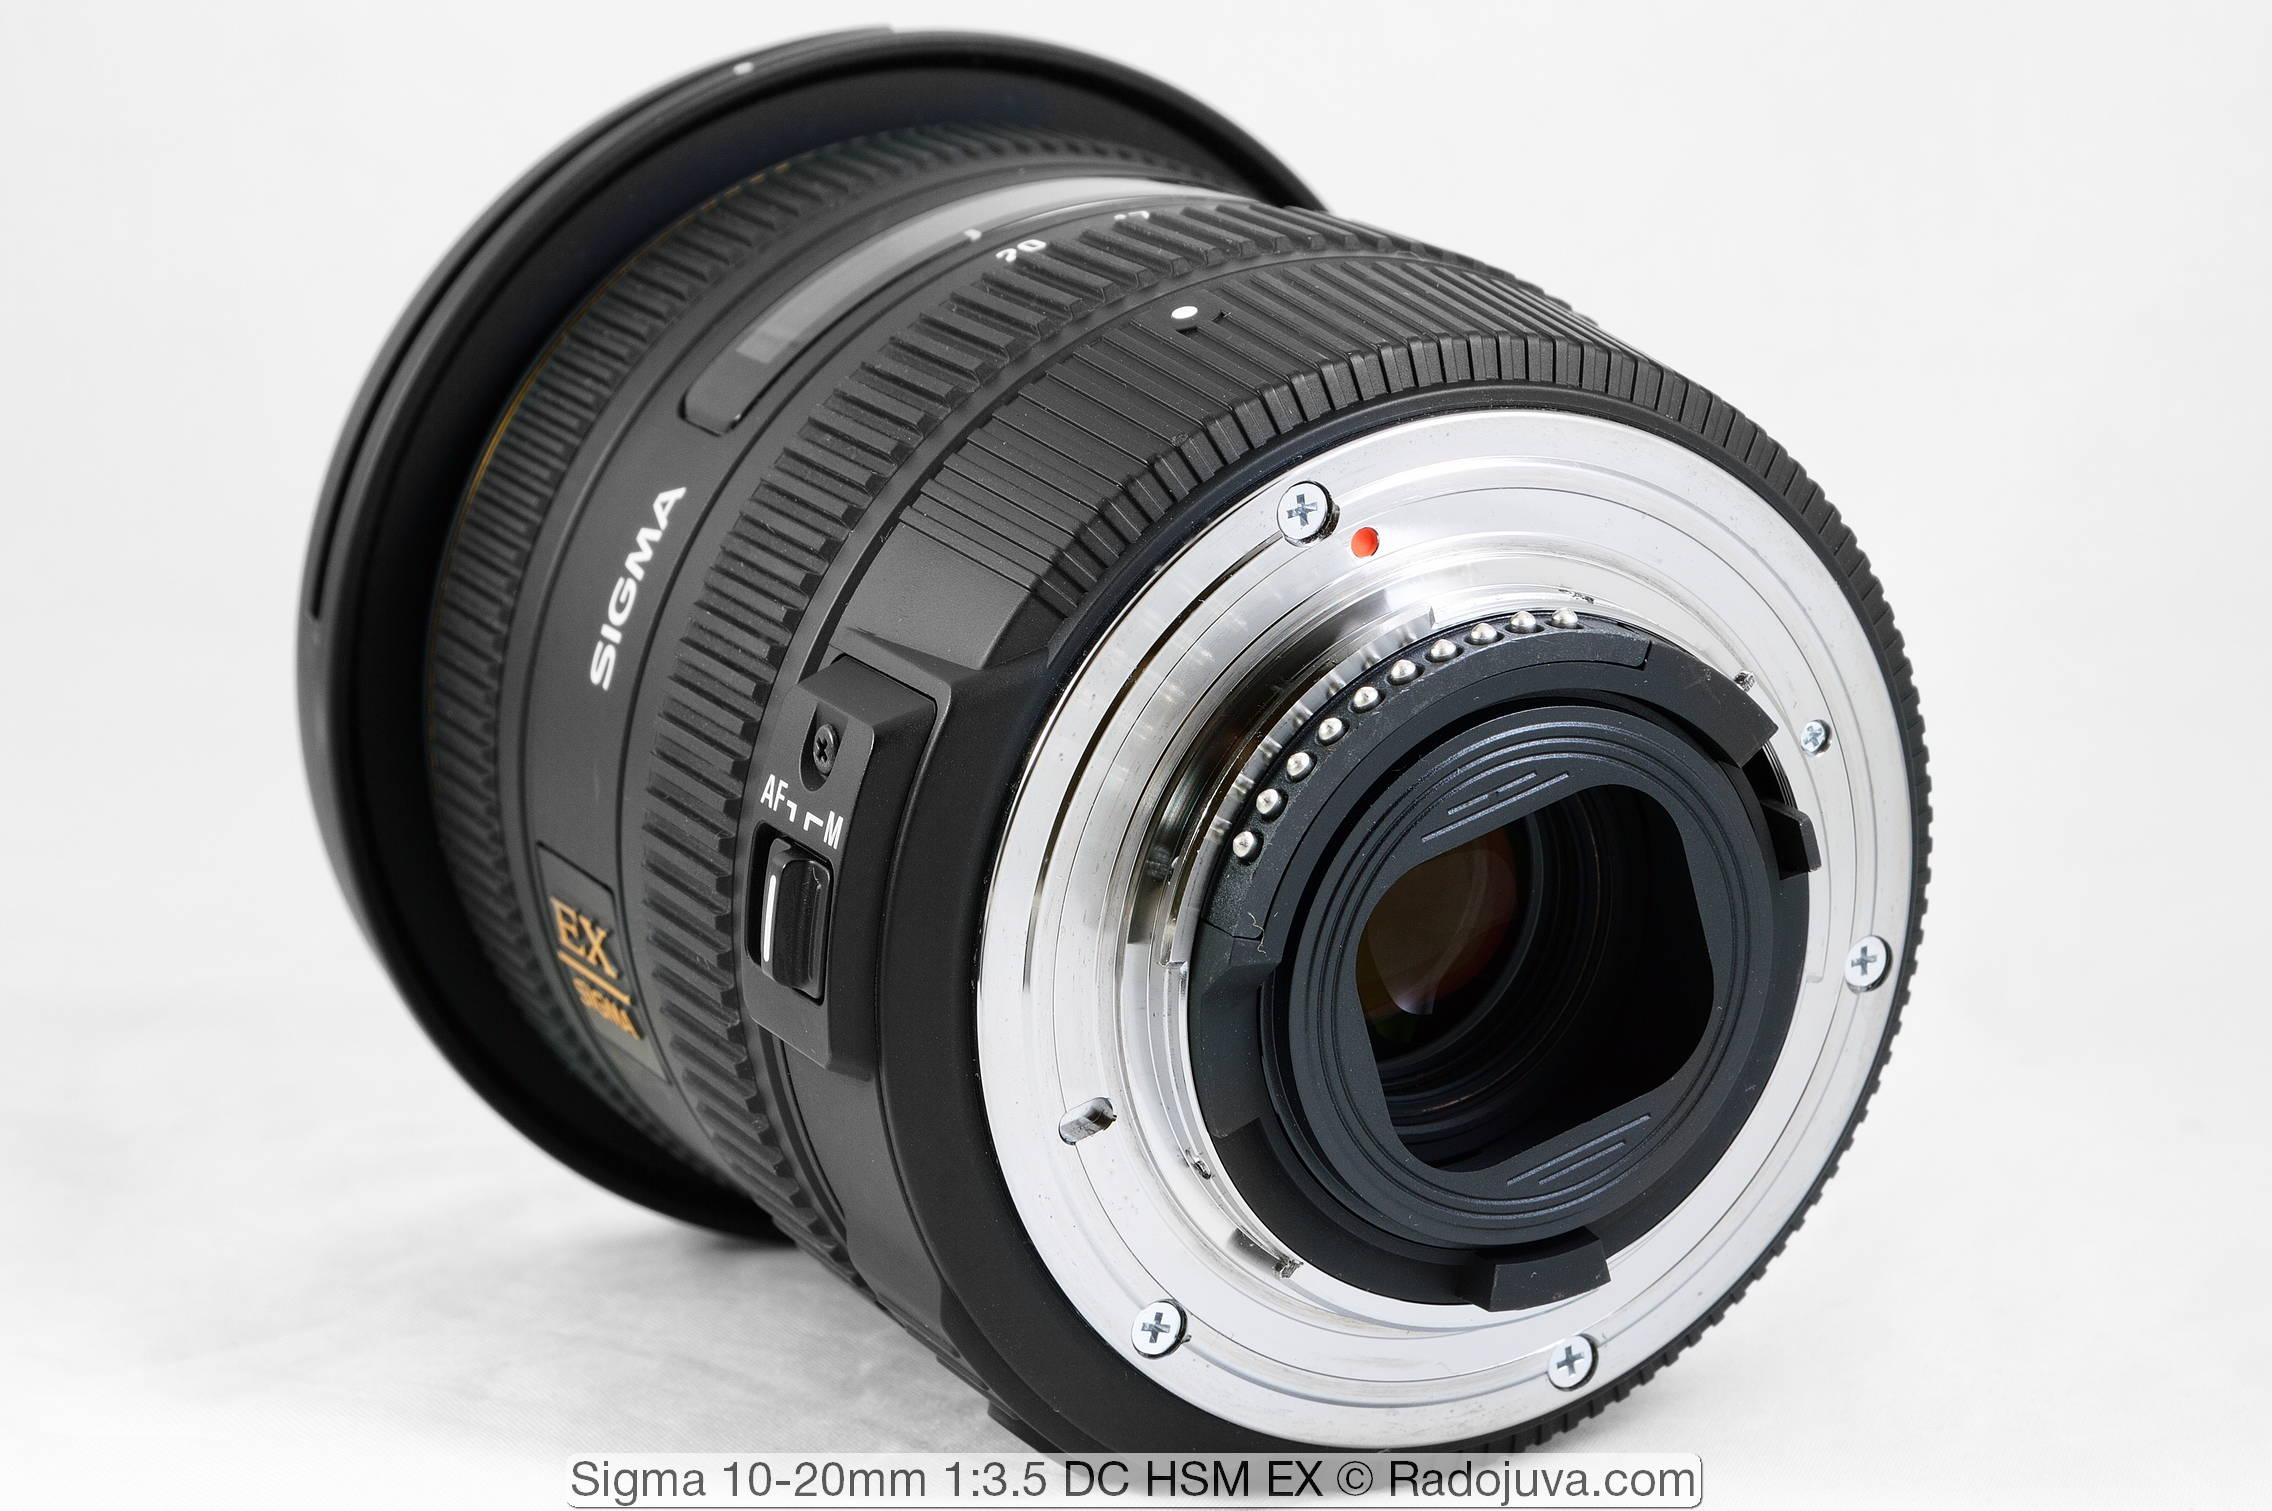 Sigma 10-20mm 1:3.5 DC HSM EX